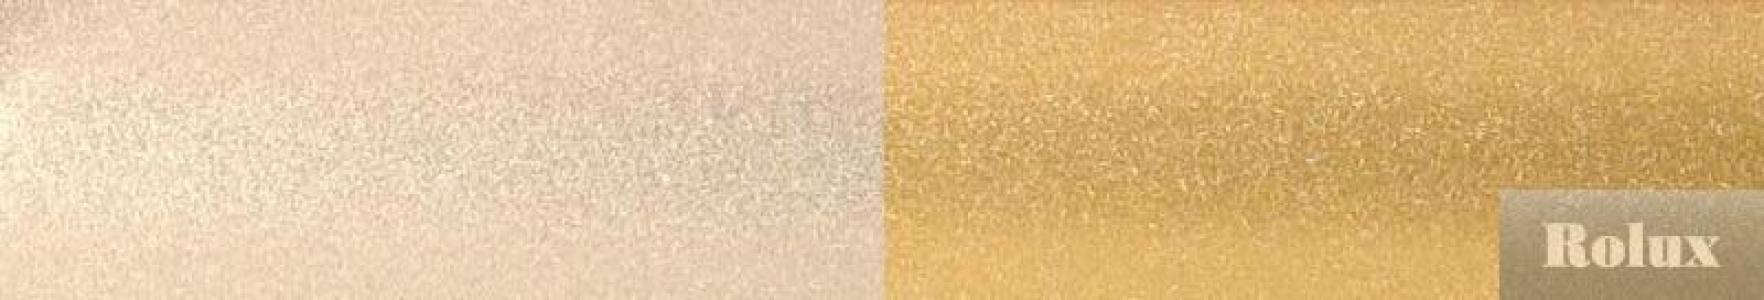 39 Zlatá-Stříbrná